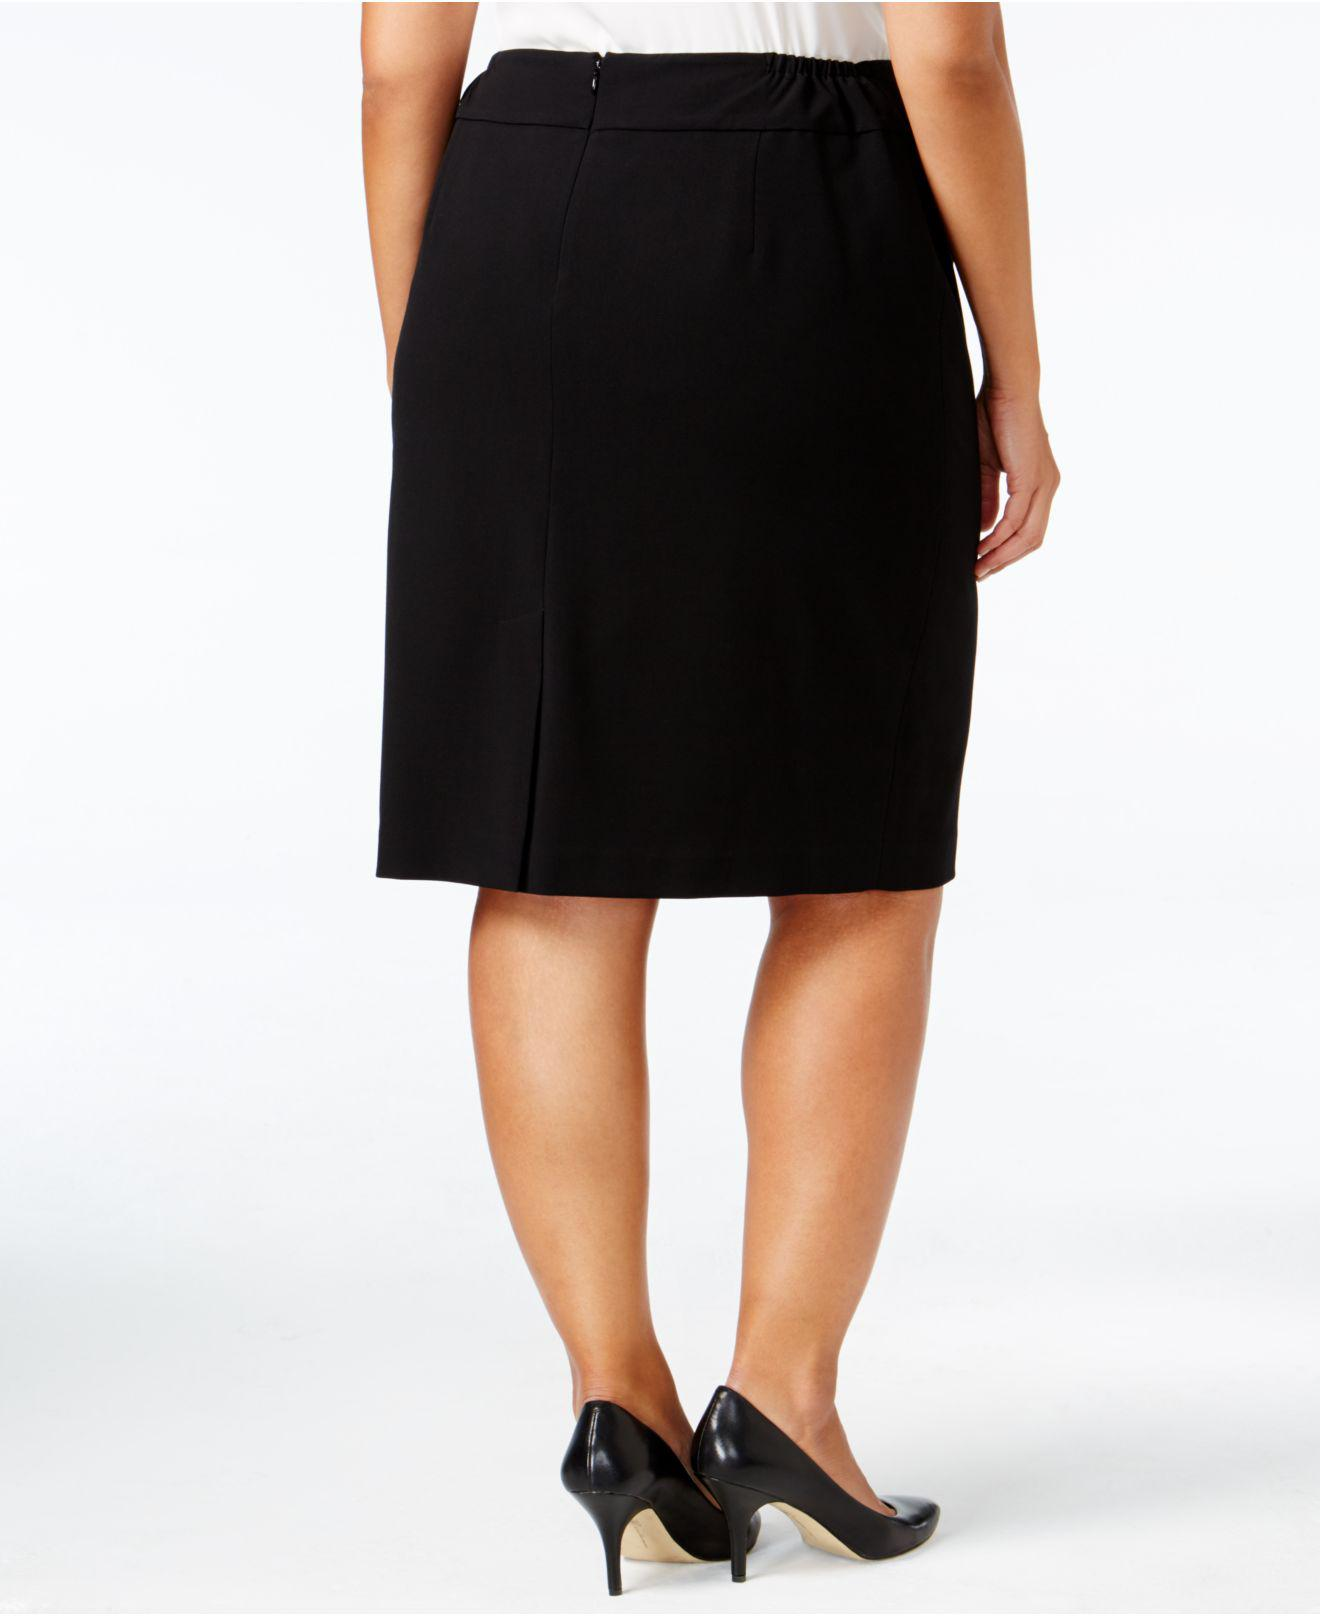 c41cbb724cfca Lyst - Nine West Plus Size Crepe Skirt in Black